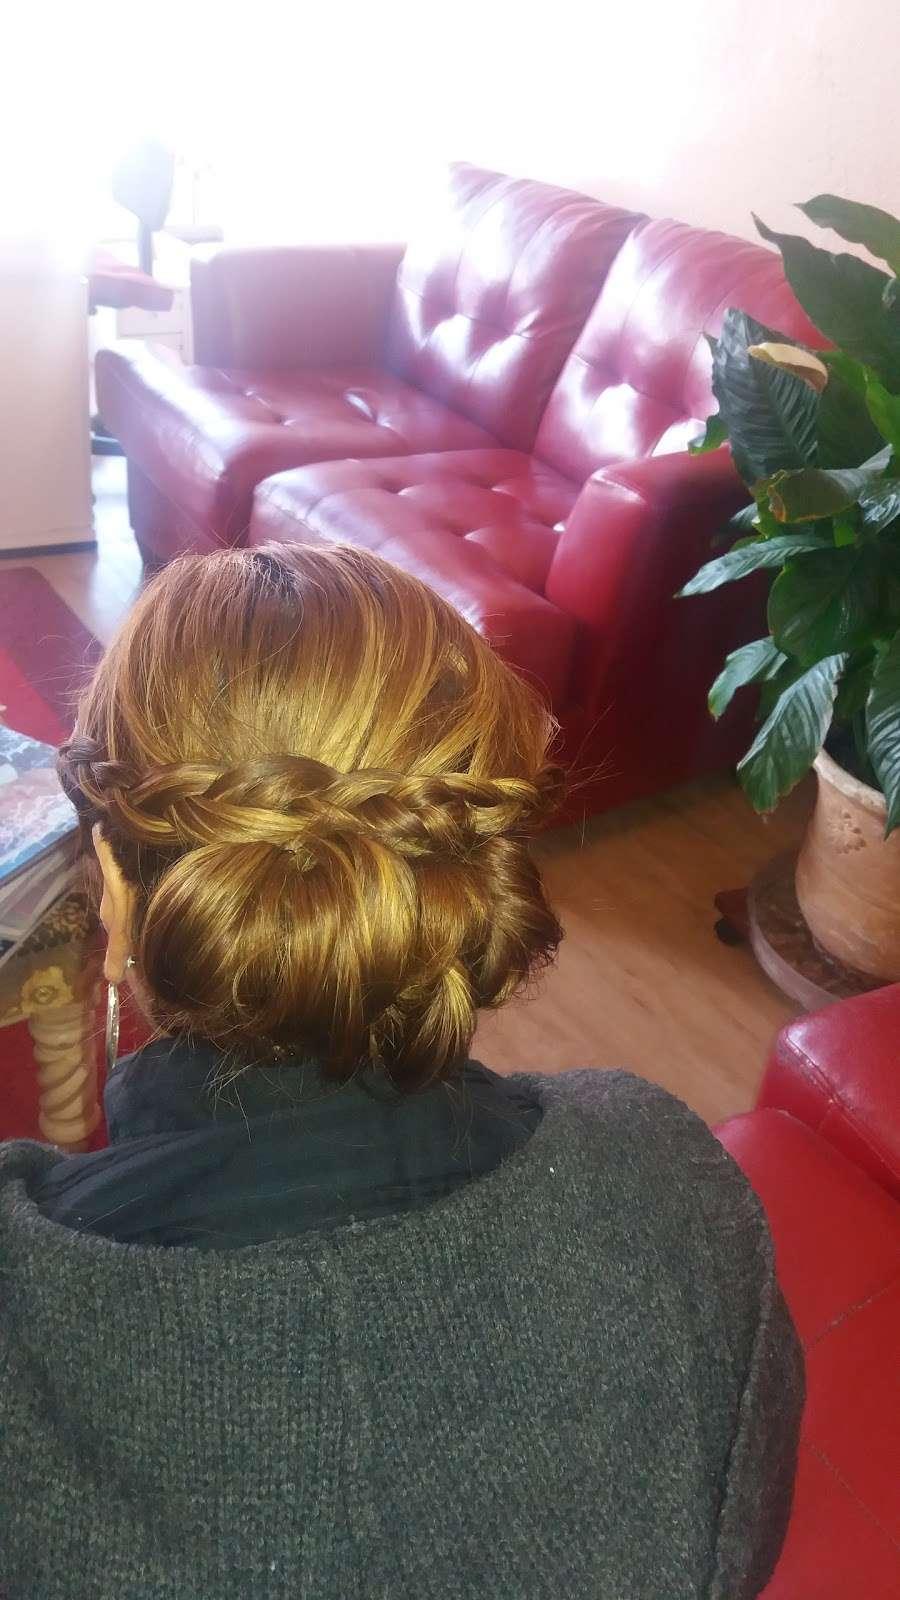 Dangela Beauty Salon - hair care  | Photo 10 of 10 | Address: 80 N Sussex St, Dover, NJ 07801, USA | Phone: (973) 978-7256